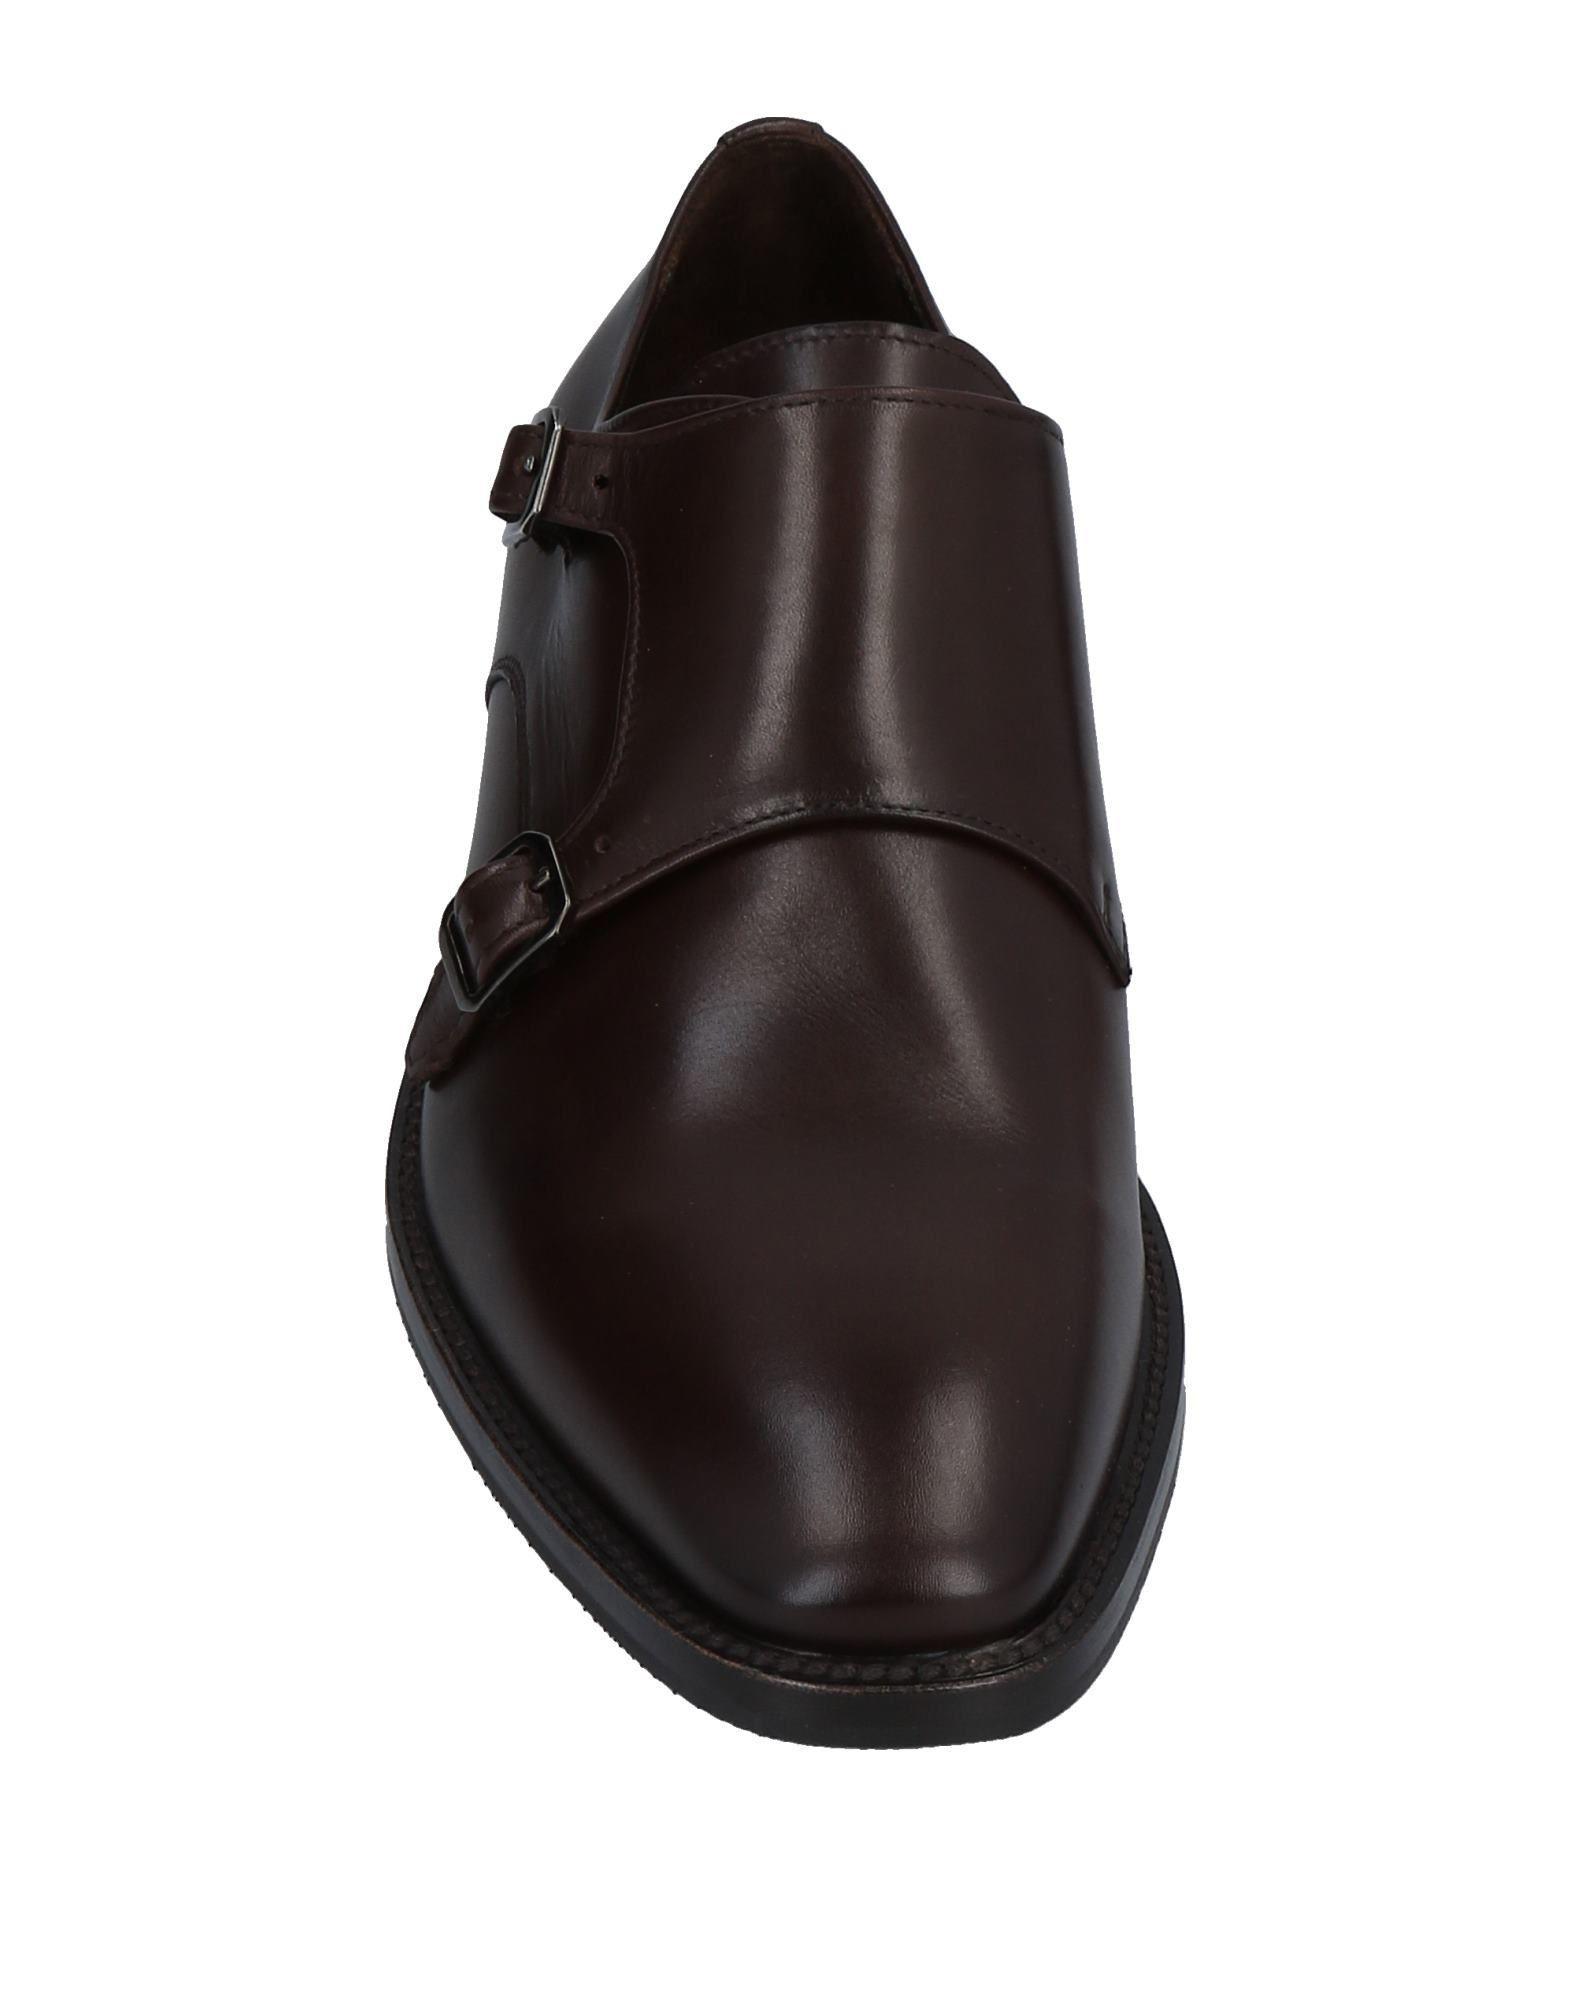 Tombolini Chaussures À Lacets UjSvCoF9tg